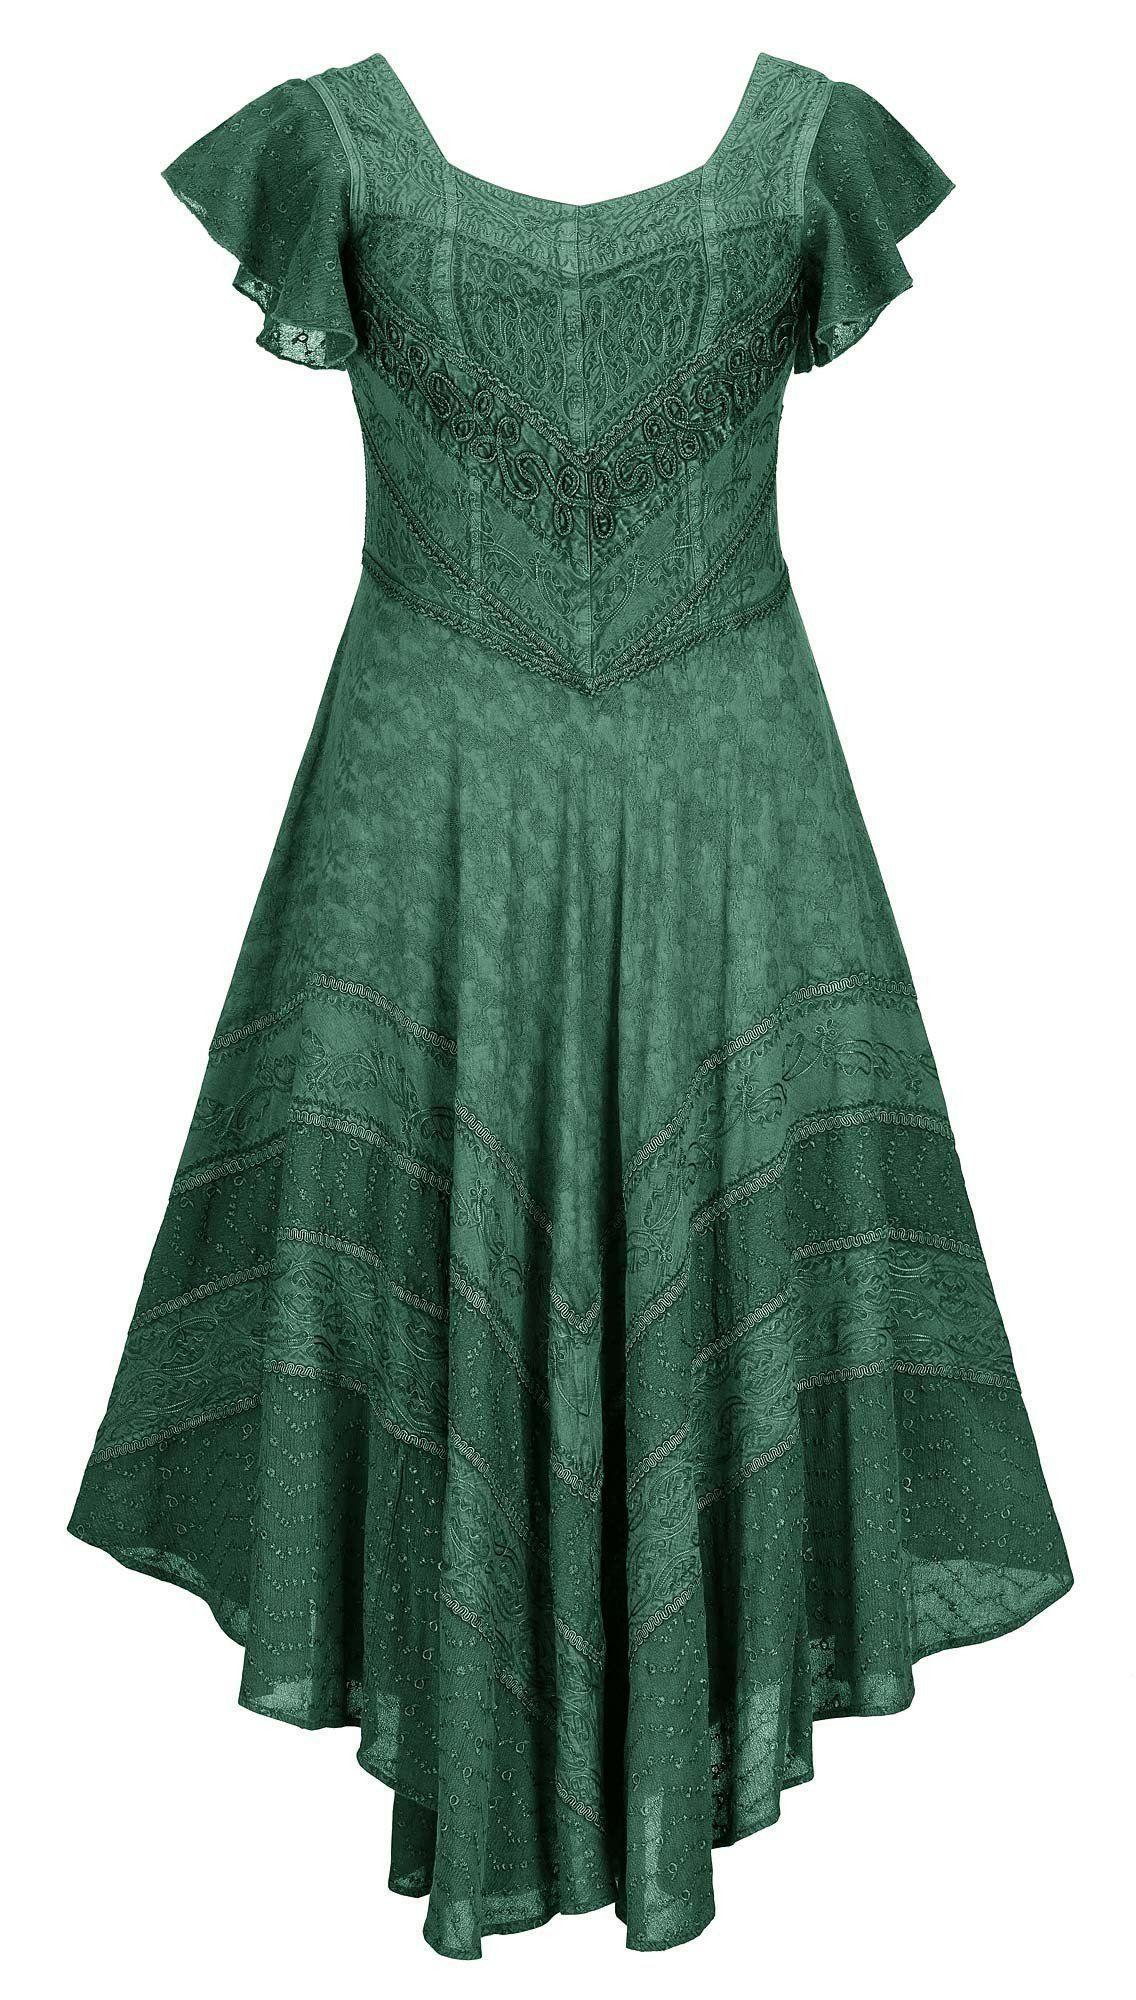 Caitlyn Maxi Dresses Target Dresses Best Party Dresses [ 2000 x 1136 Pixel ]